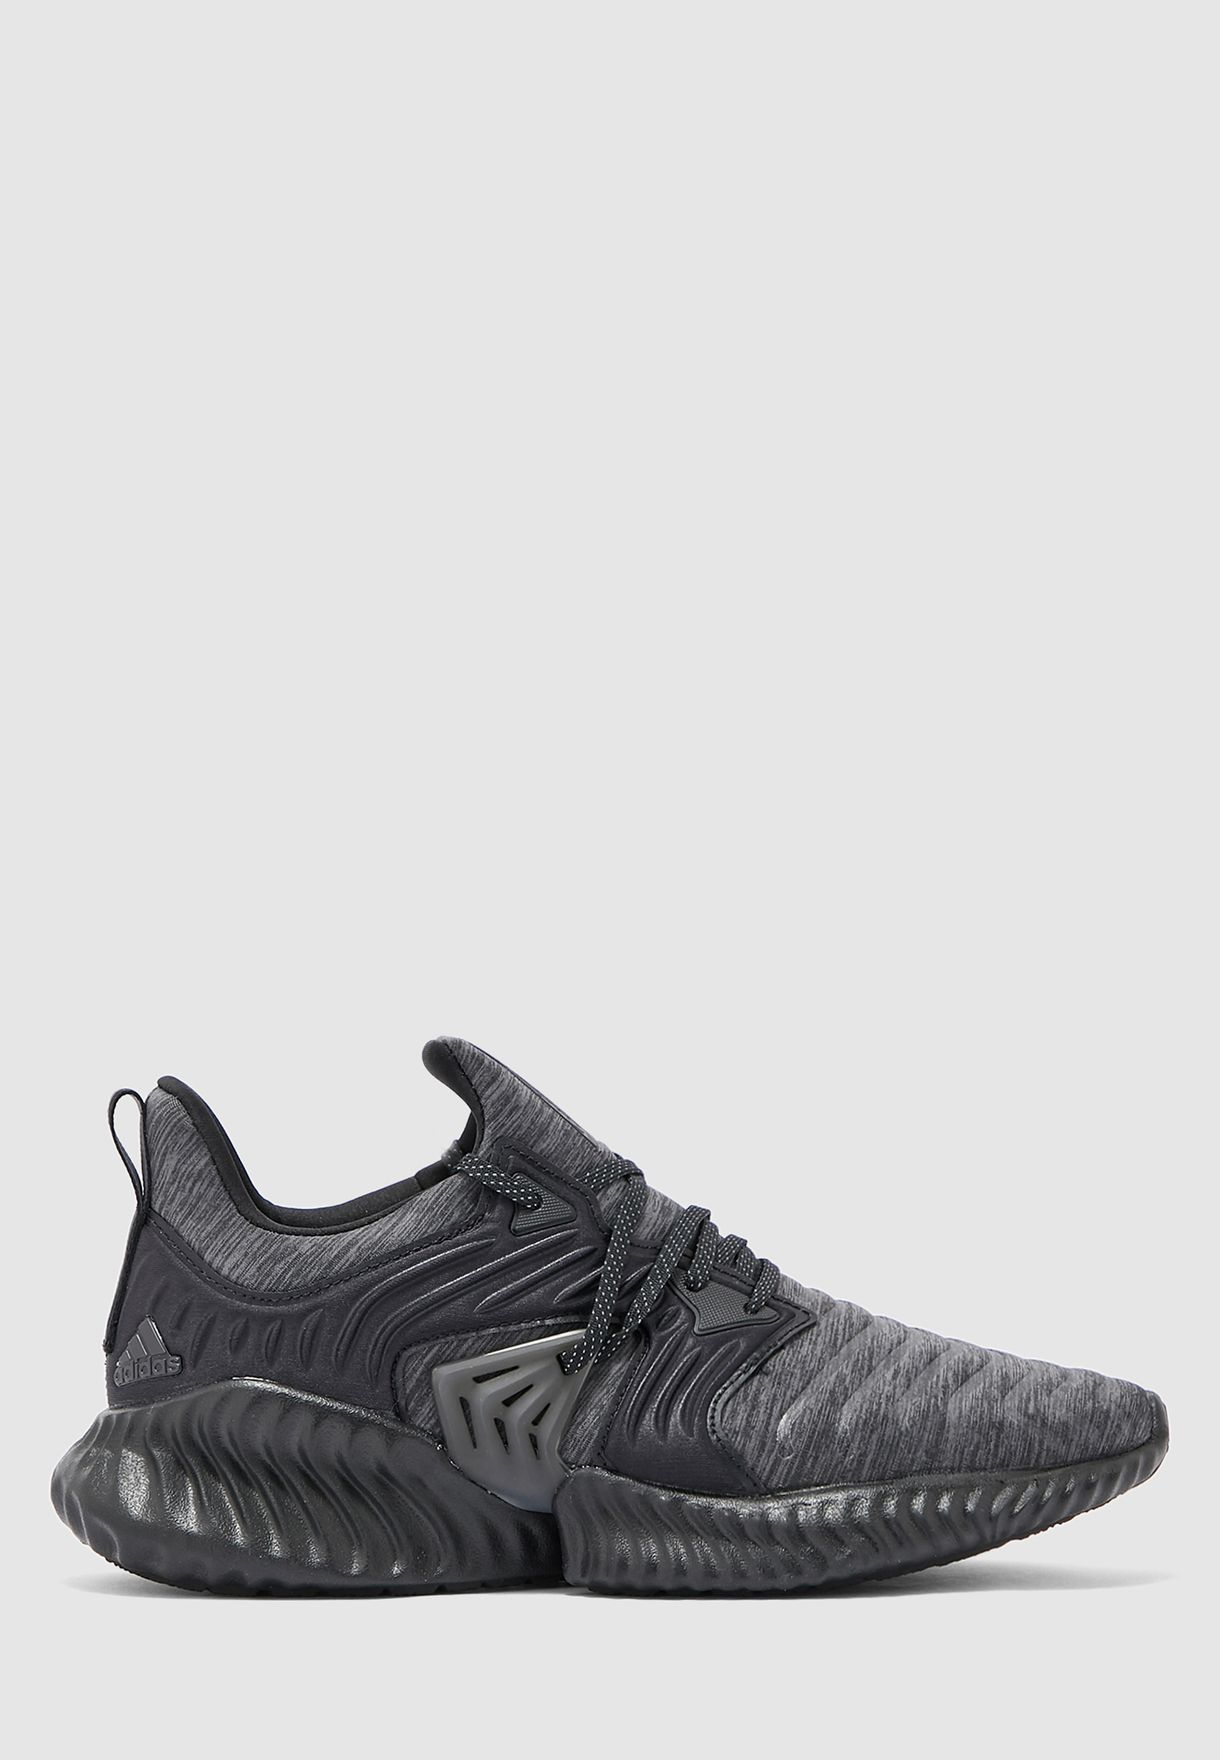 : adidas Men's Alphabounce Instinct CC M, Black